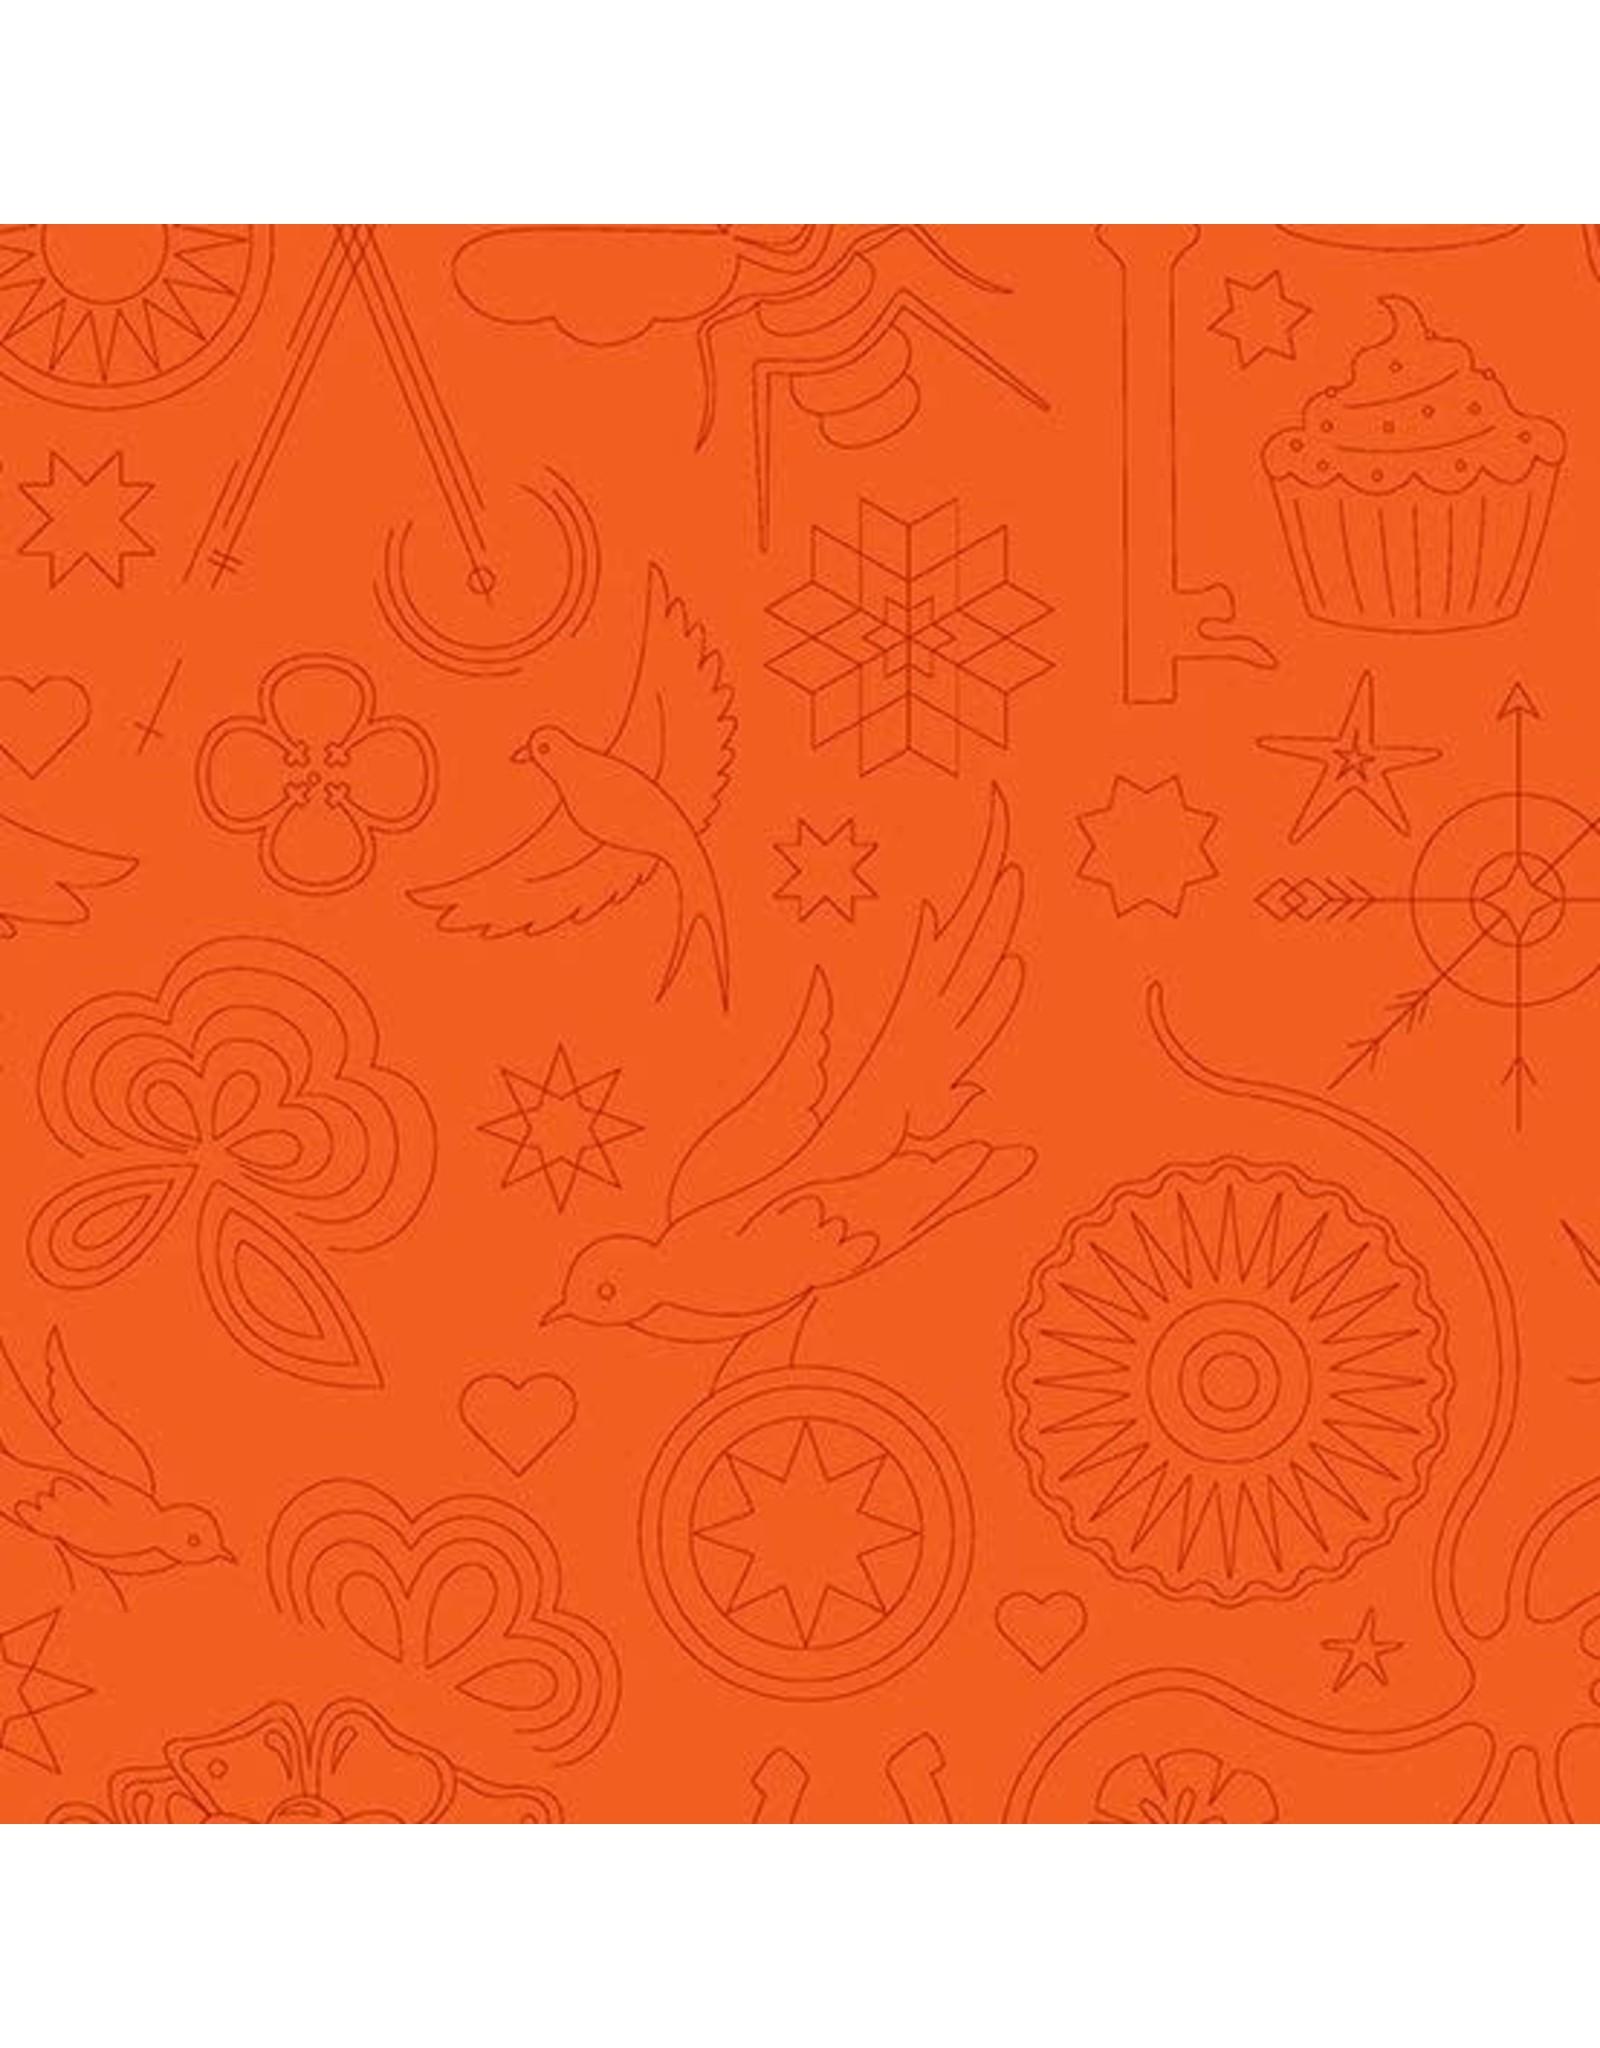 Alison Glass Sun Print 2020, Embroidery in Pumpkin, Fabric Half-Yards A-9256-O